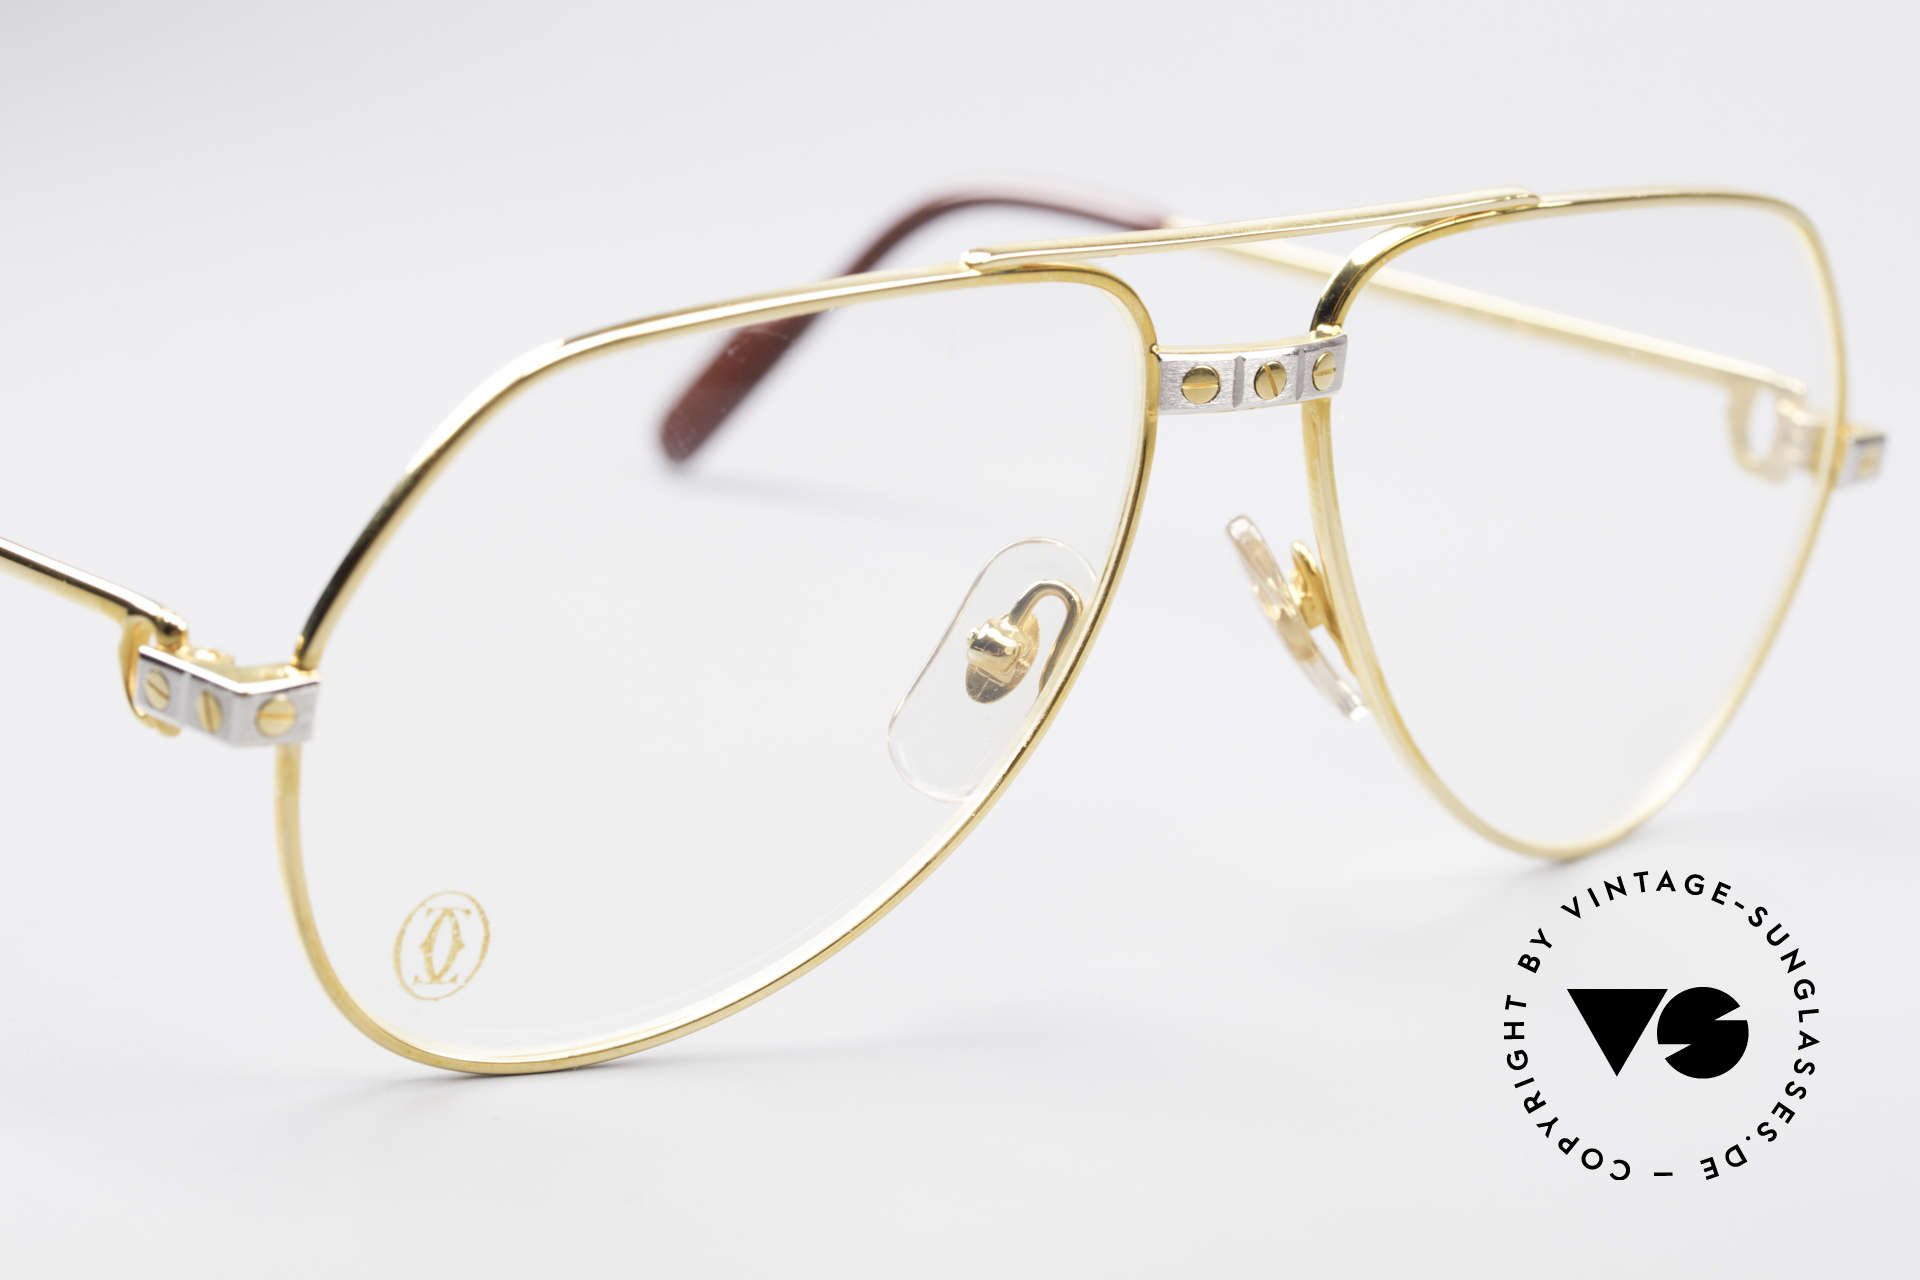 Cartier Vendome Santos - S James Bond Eyeglasses 1980's, worn by actor Christopher Walken (JAMES BOND, 1985), Made for Men and Women